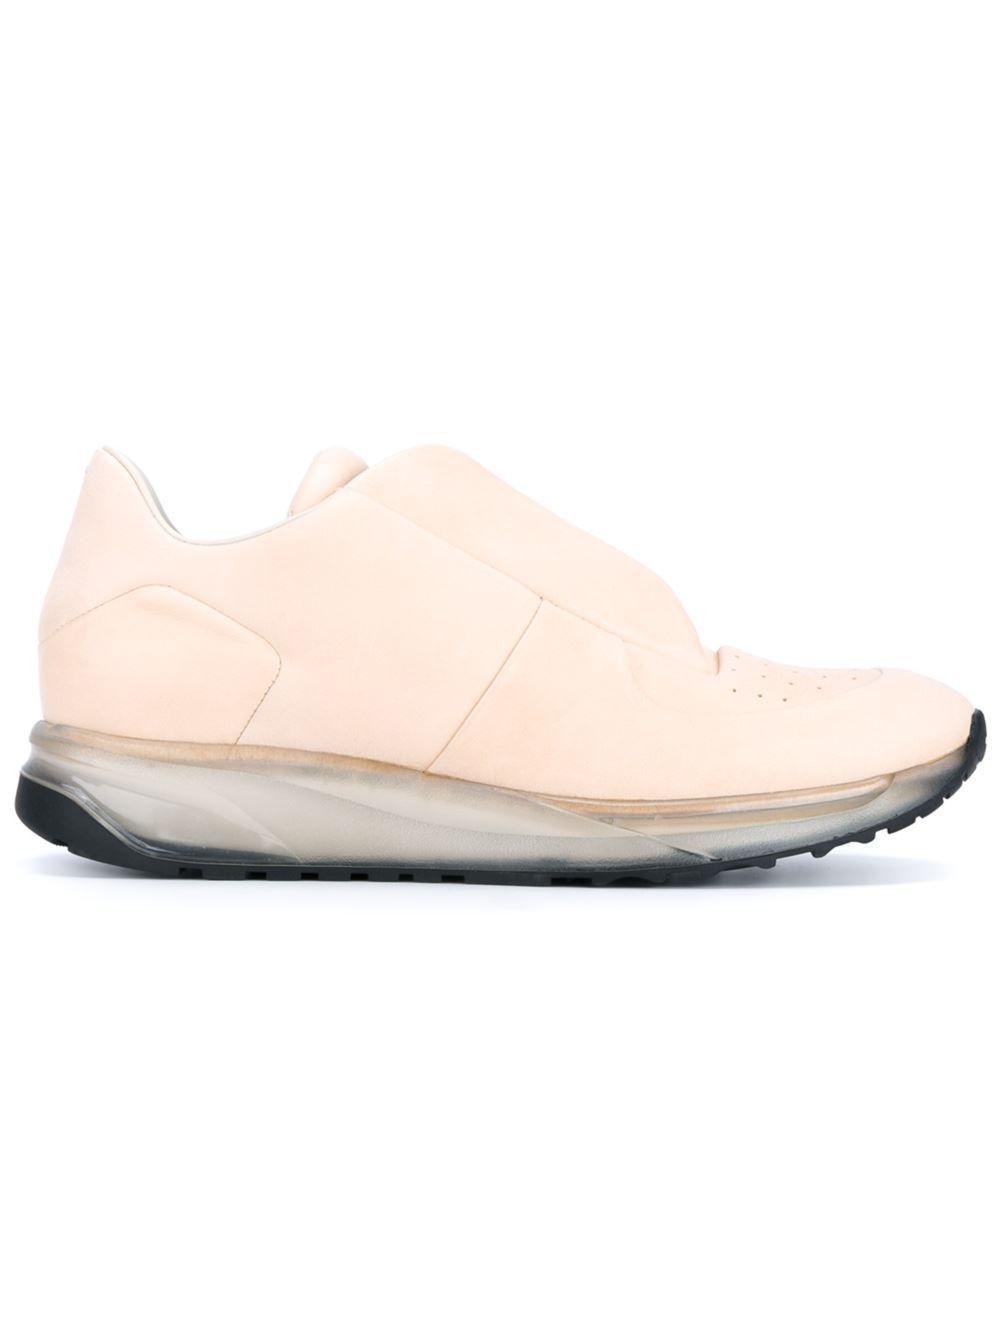 Maison Margiela trasparent concealed vamp sneakers